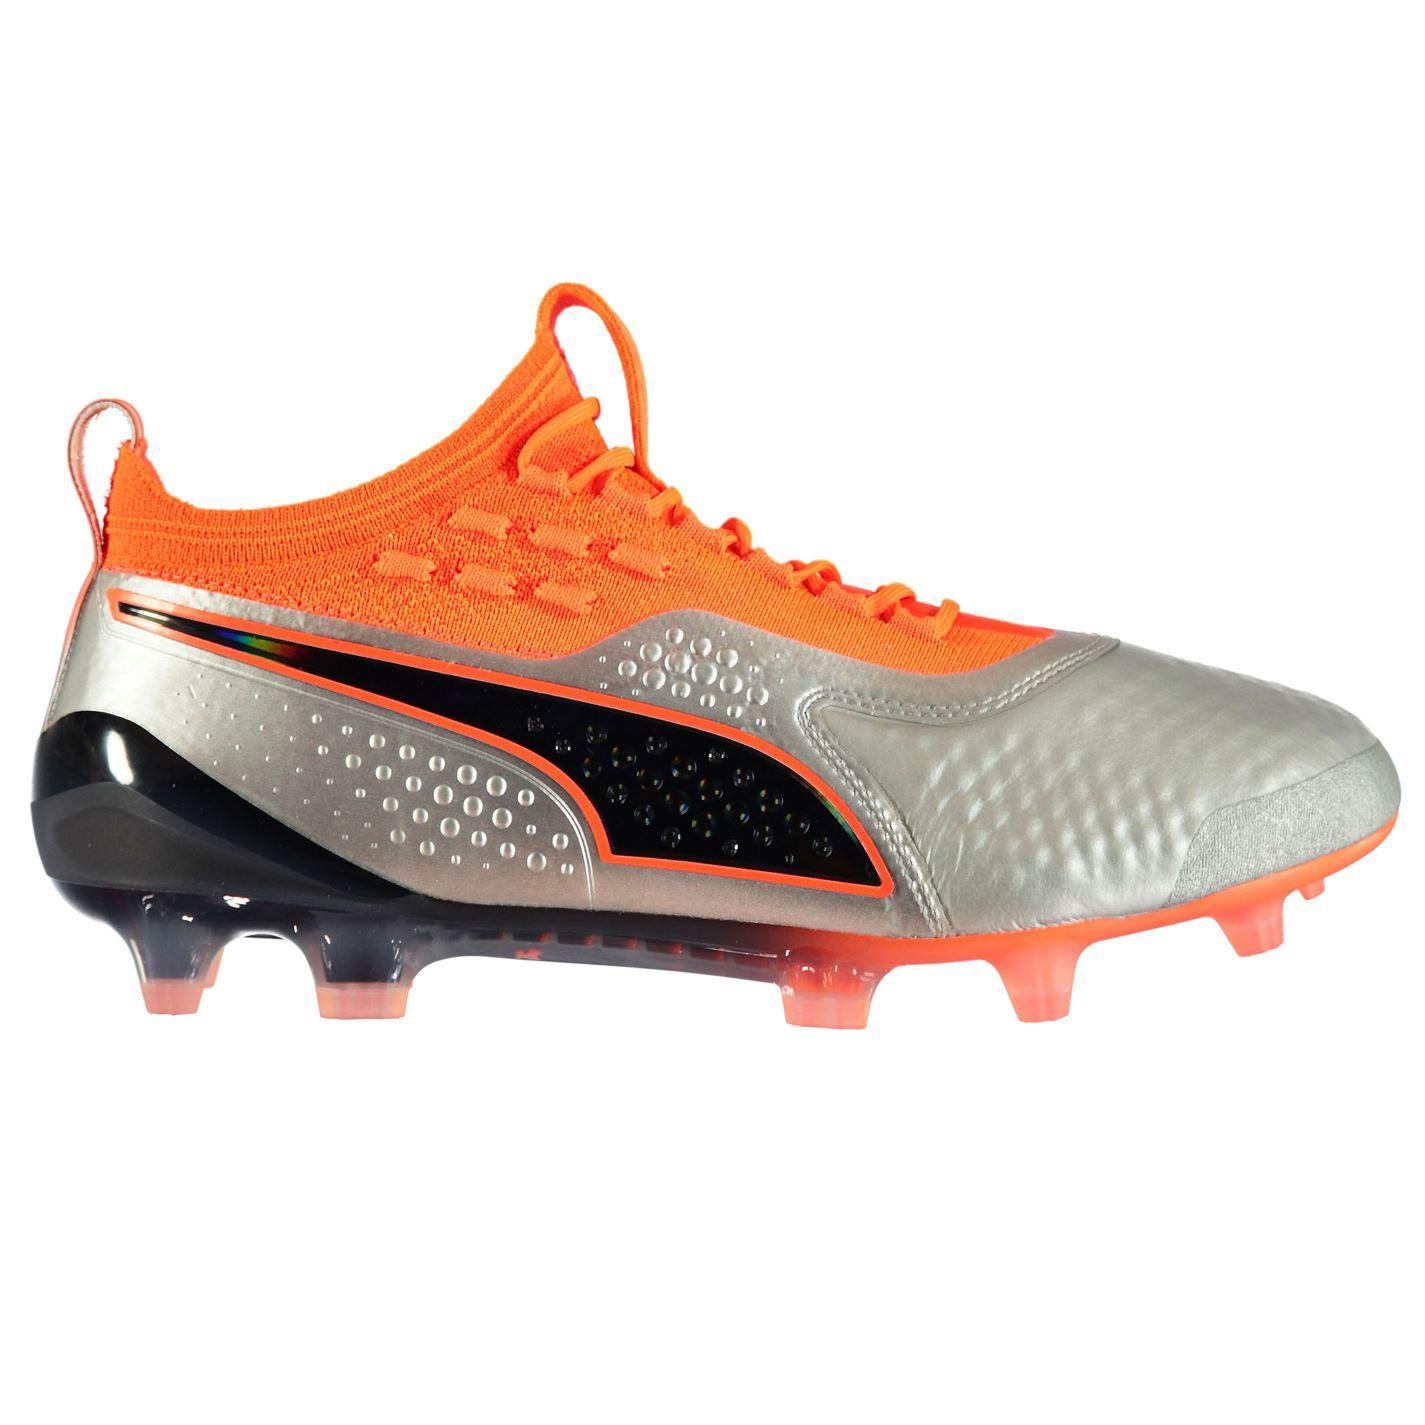 miniature 6 - PUMA 1 Fg Firm Ground Chaussures De Football Homme Football Chaussures Crampons